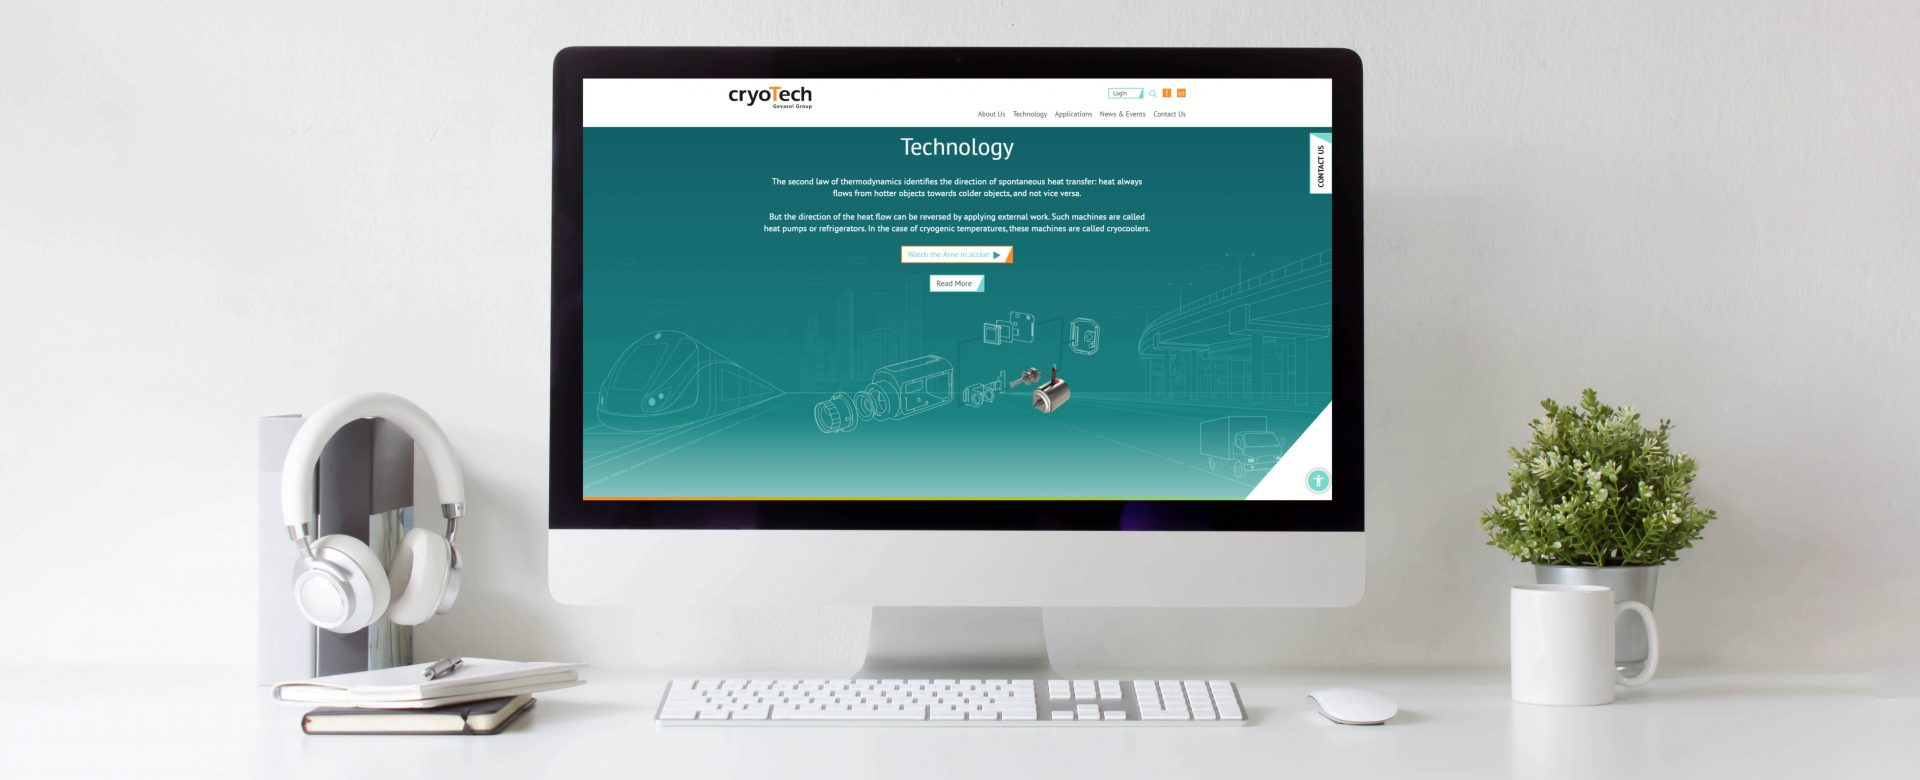 cryoTech 4